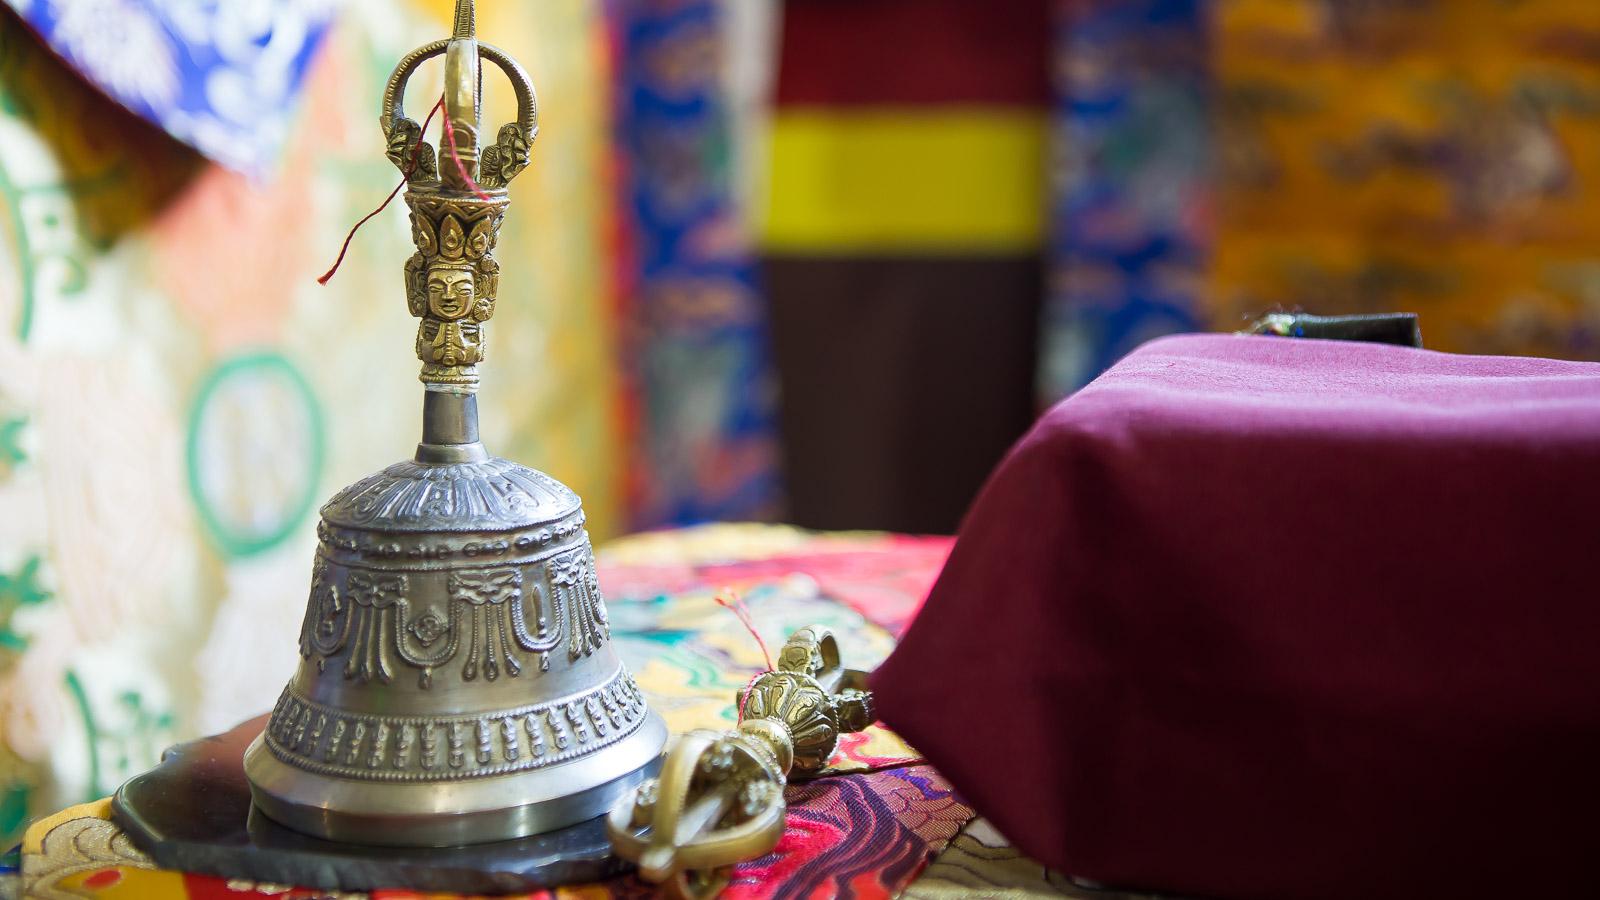 Mahaprajnaparamitashastra 49 – Sabedoria